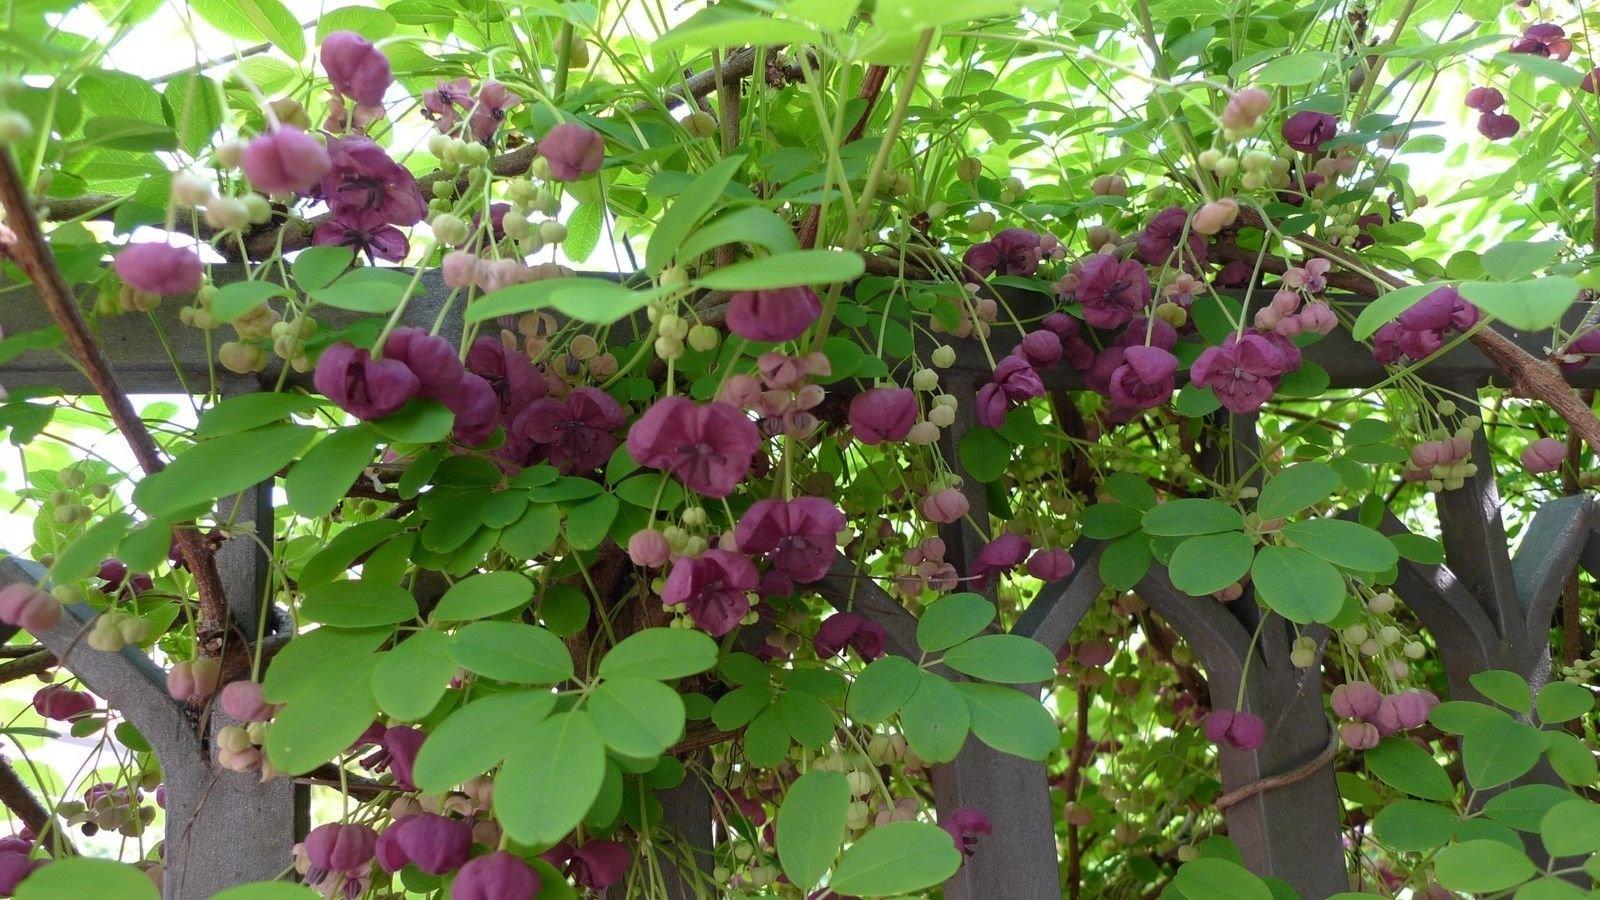 AKEBIA QUINATA - Chocolate Vine - Starter Plant